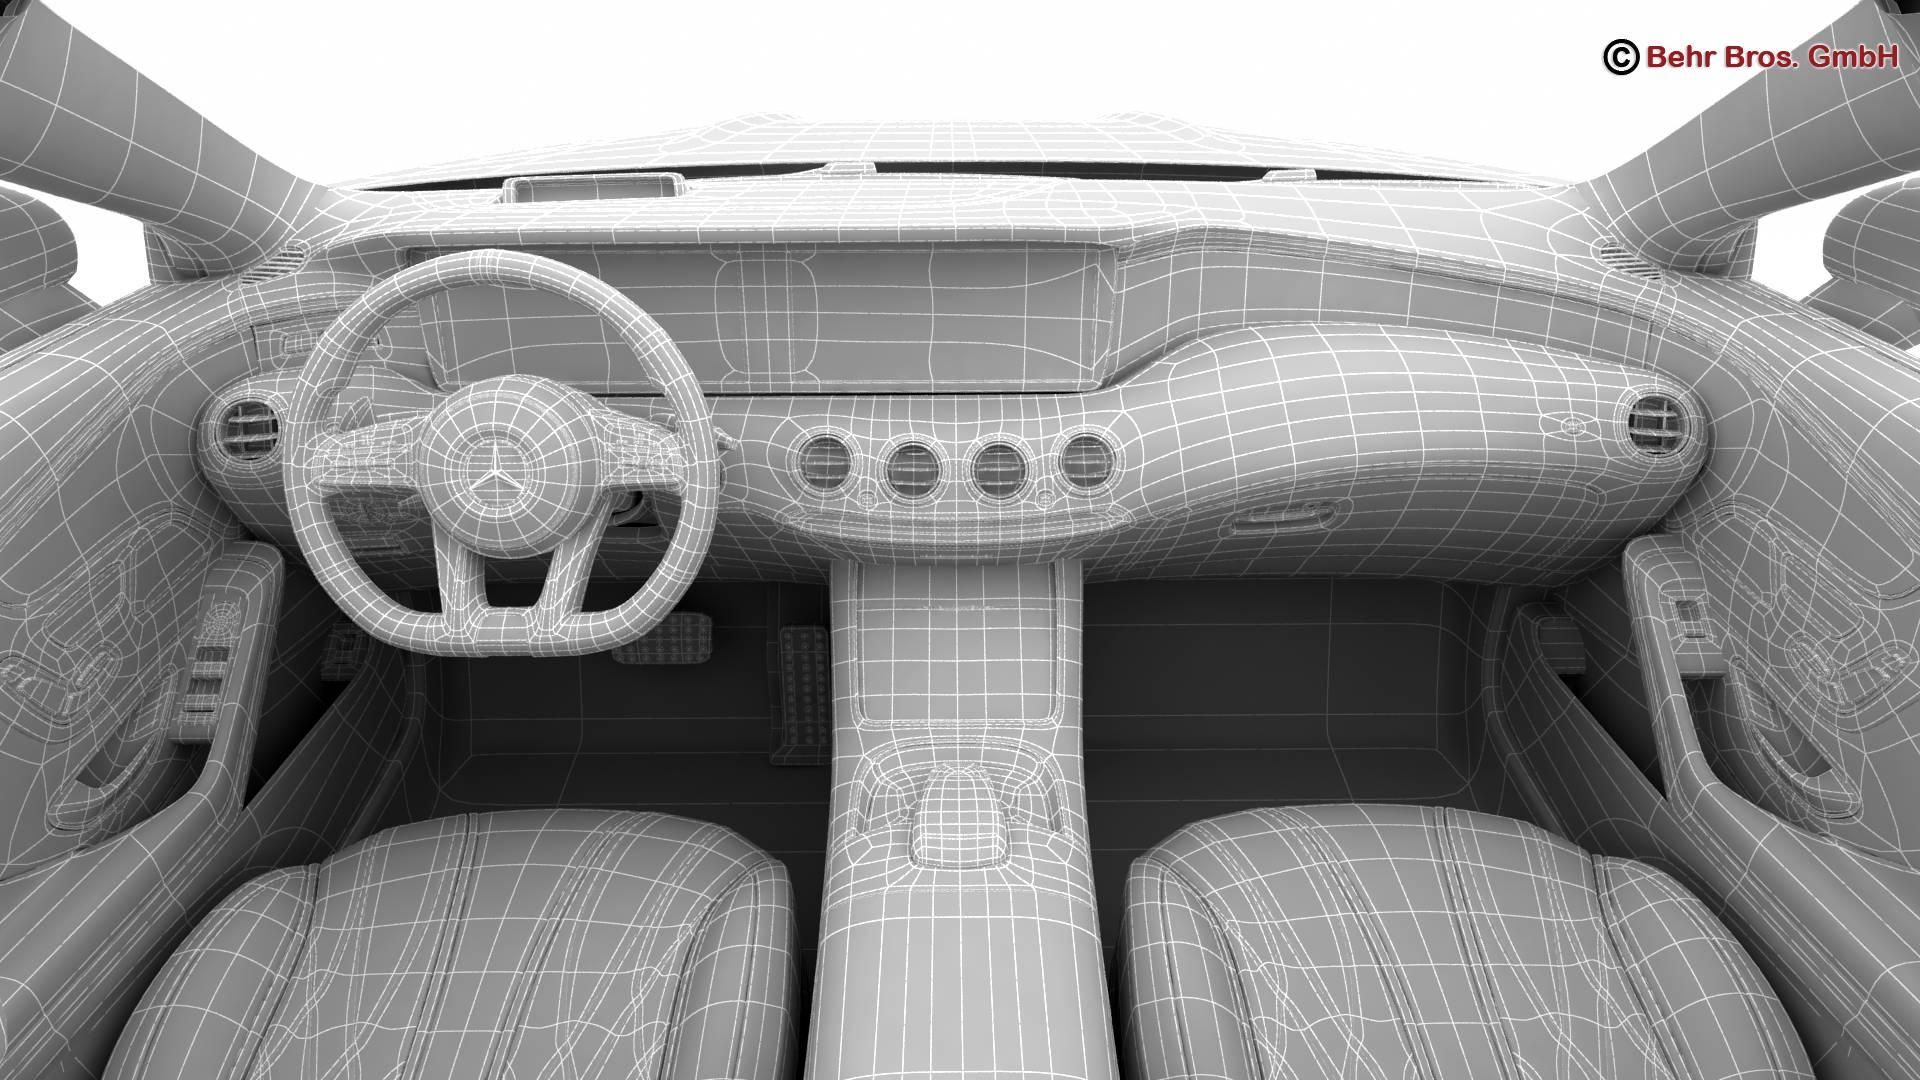 mercedes s class coupe amg s63 2018 3d model 3ds max fbx c4d lwo ma mb obj 274116